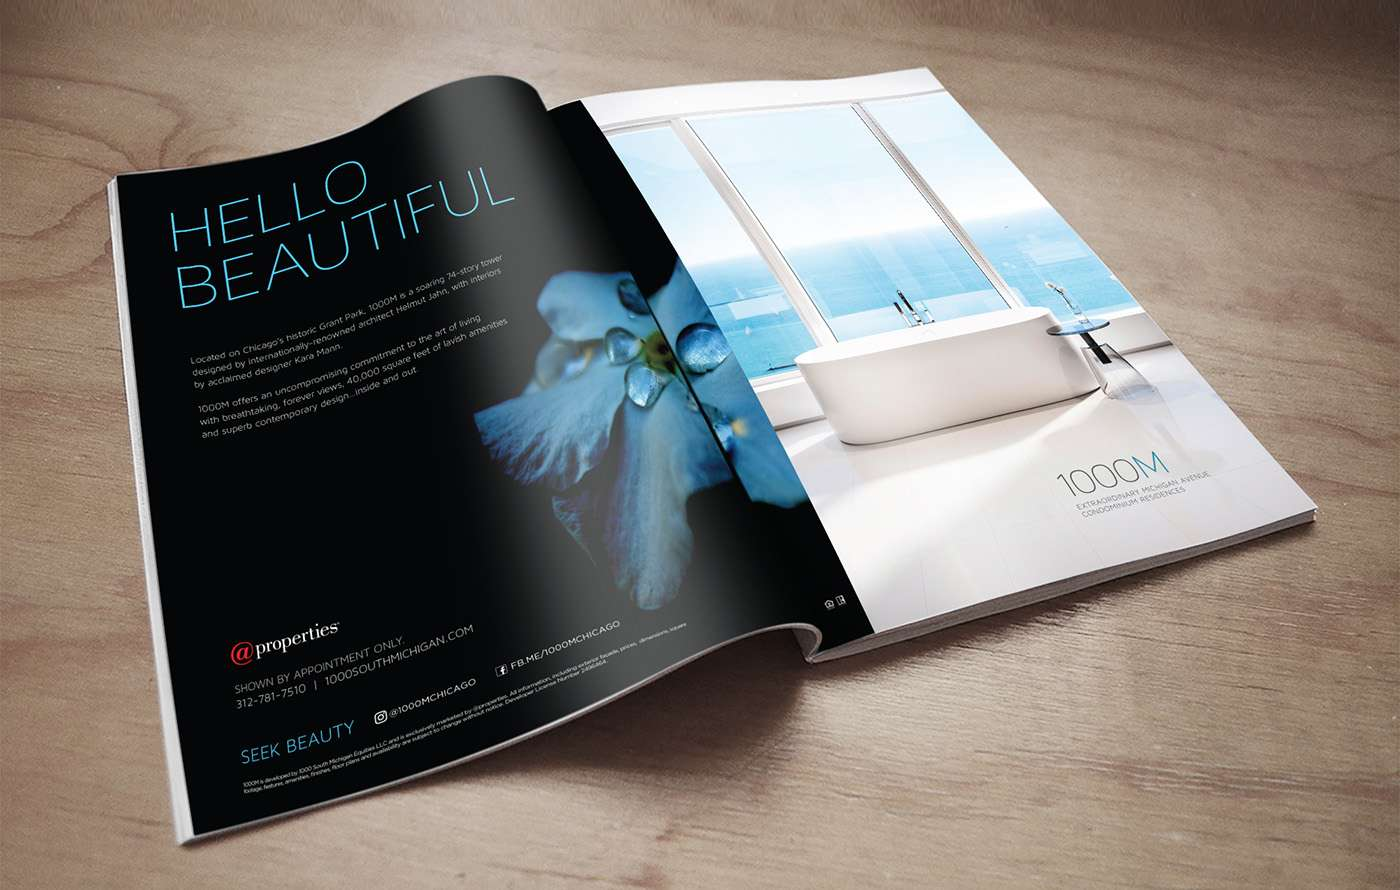 Print magazine ad with Hello Beautiful 1000M creative ad campaign